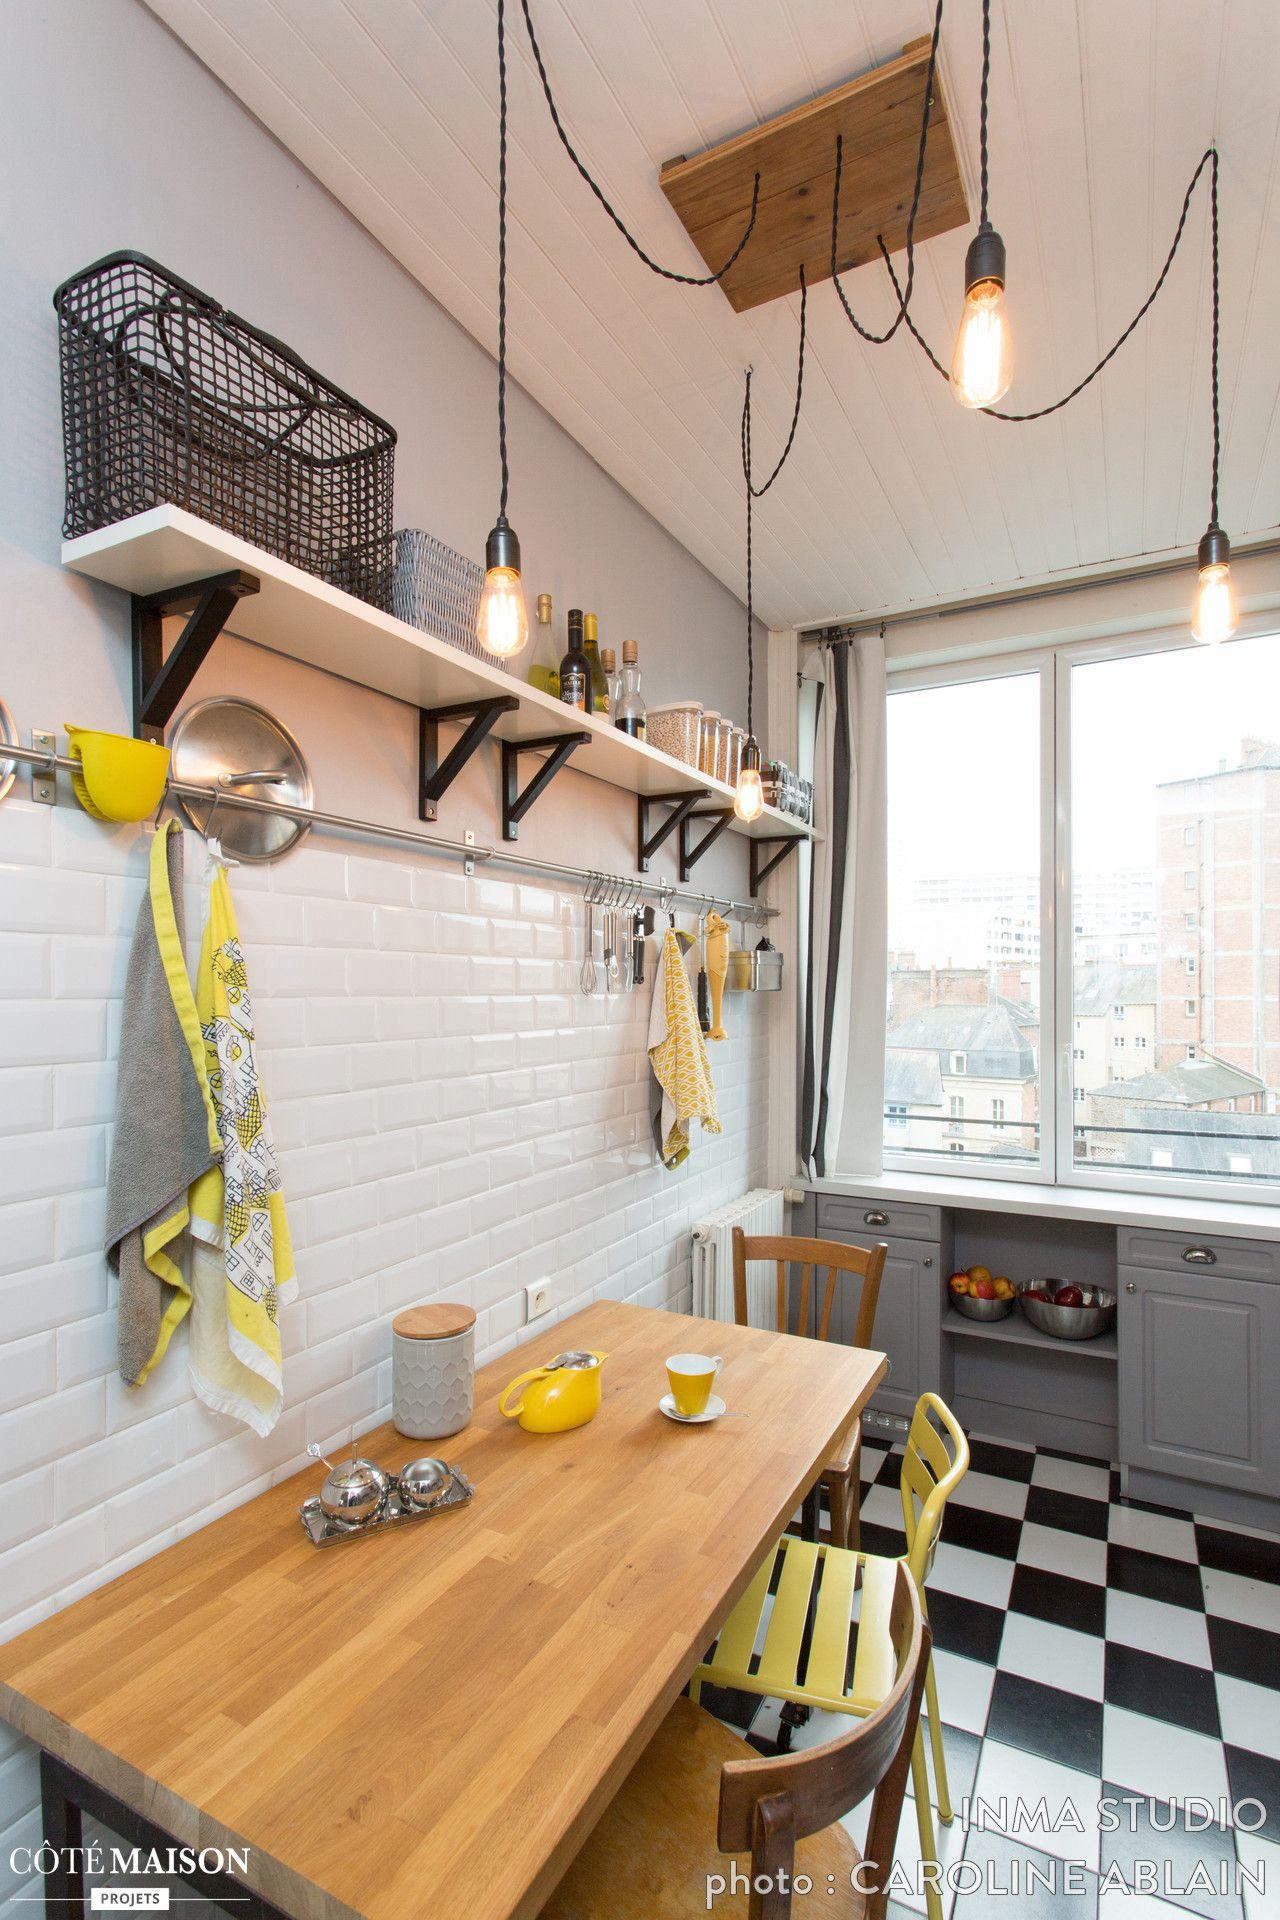 Home Relooking D Un Appart De 120 M2 A Rennes Inma Studio Cote